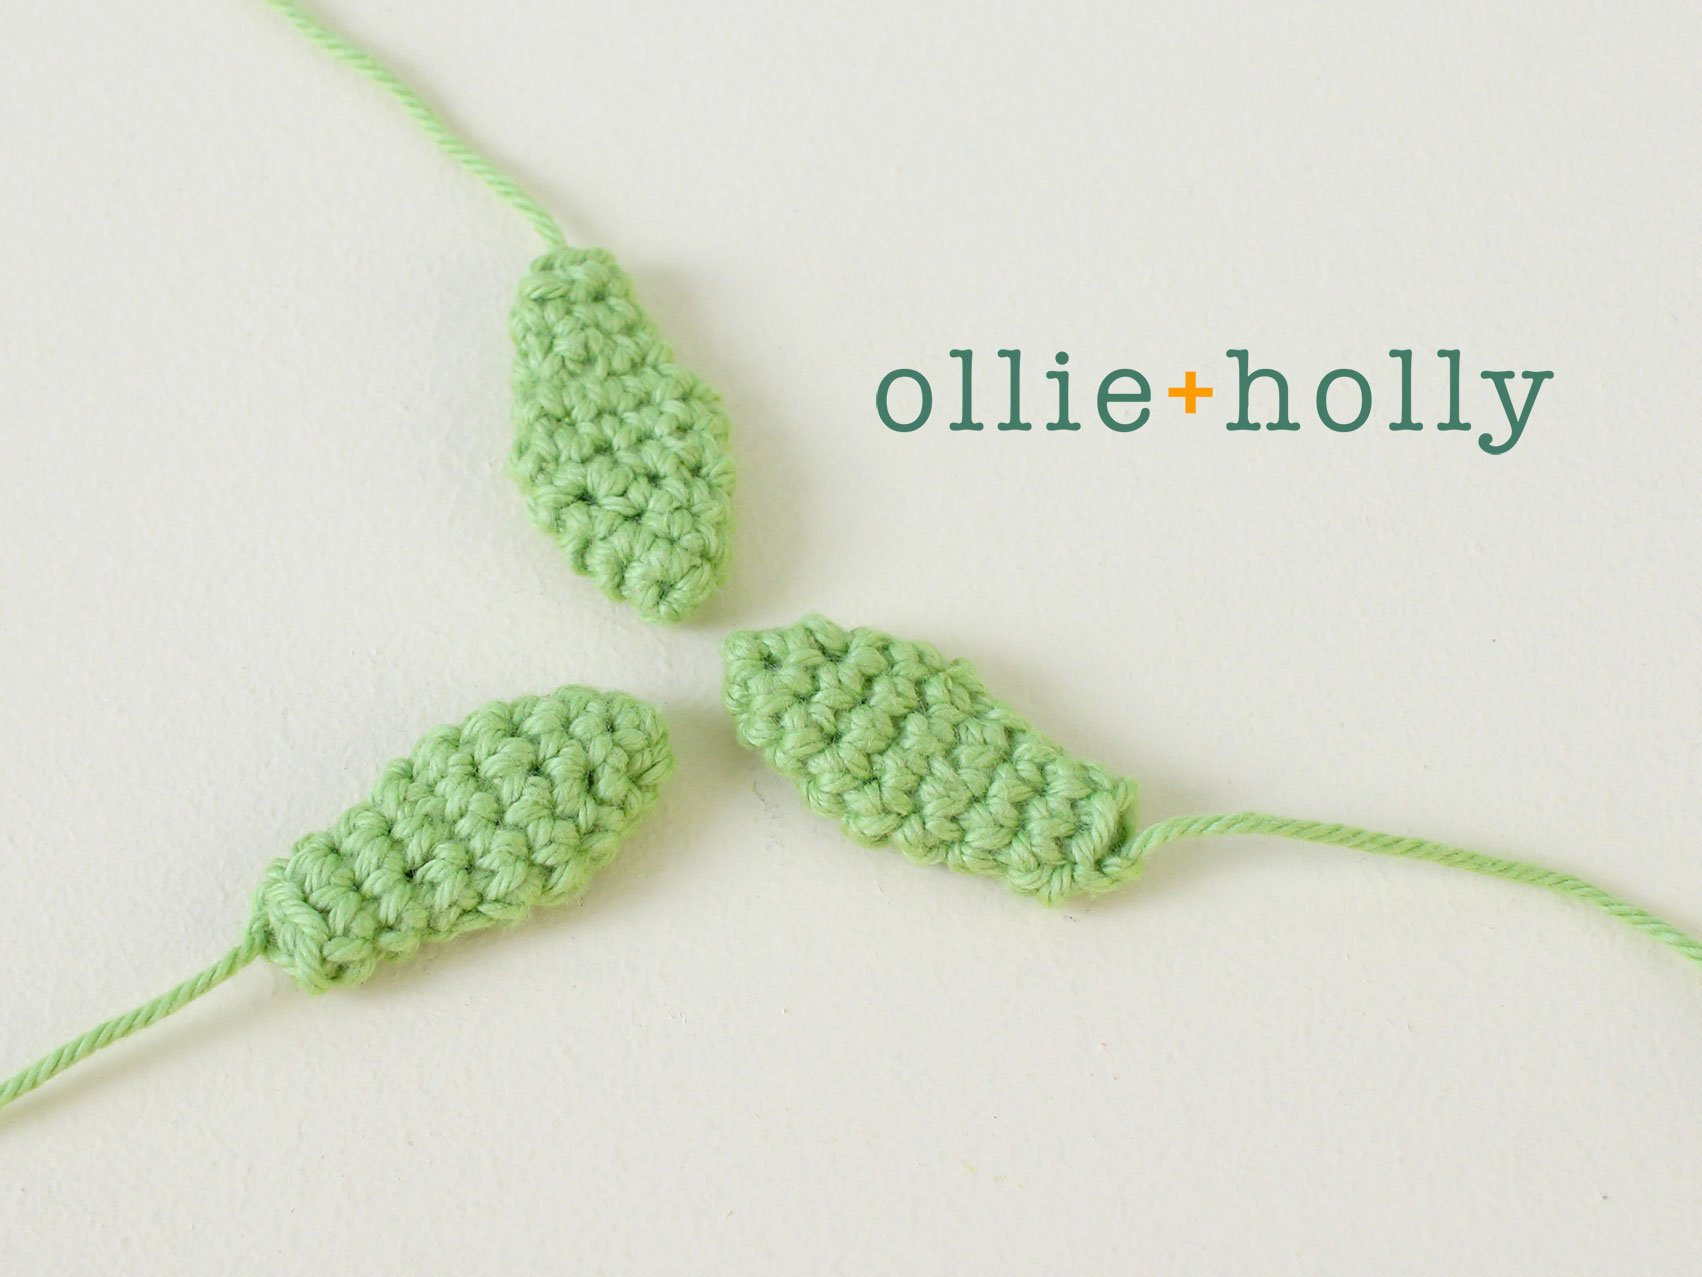 Free Sedum Adolphii Succulents (Golden Glow) Amigurumi Crochet Pattern Step 5